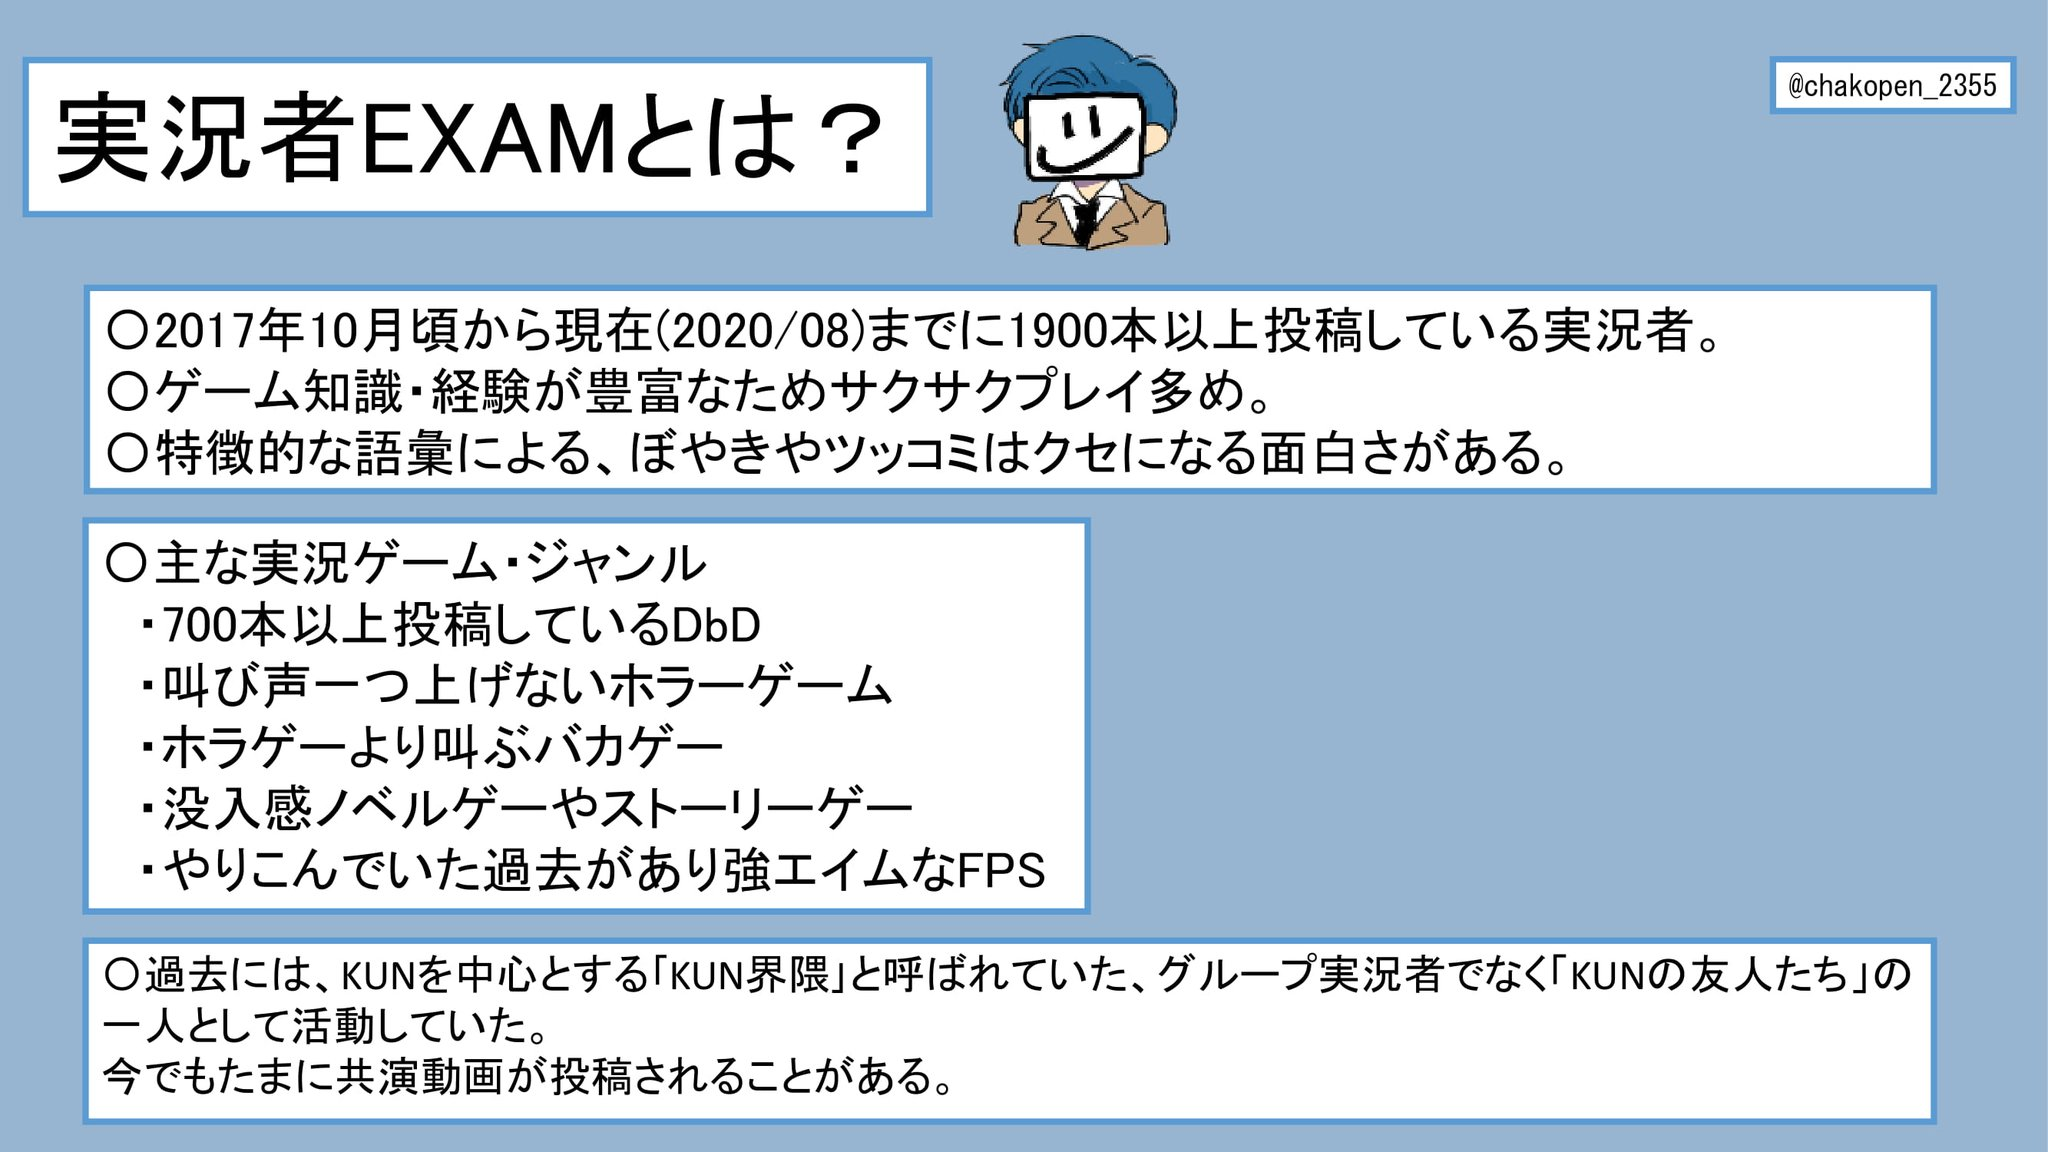 Exam 実況 者 ゲーム実況者「EXAM」のプロフィール ゲーム実況歴まとめ